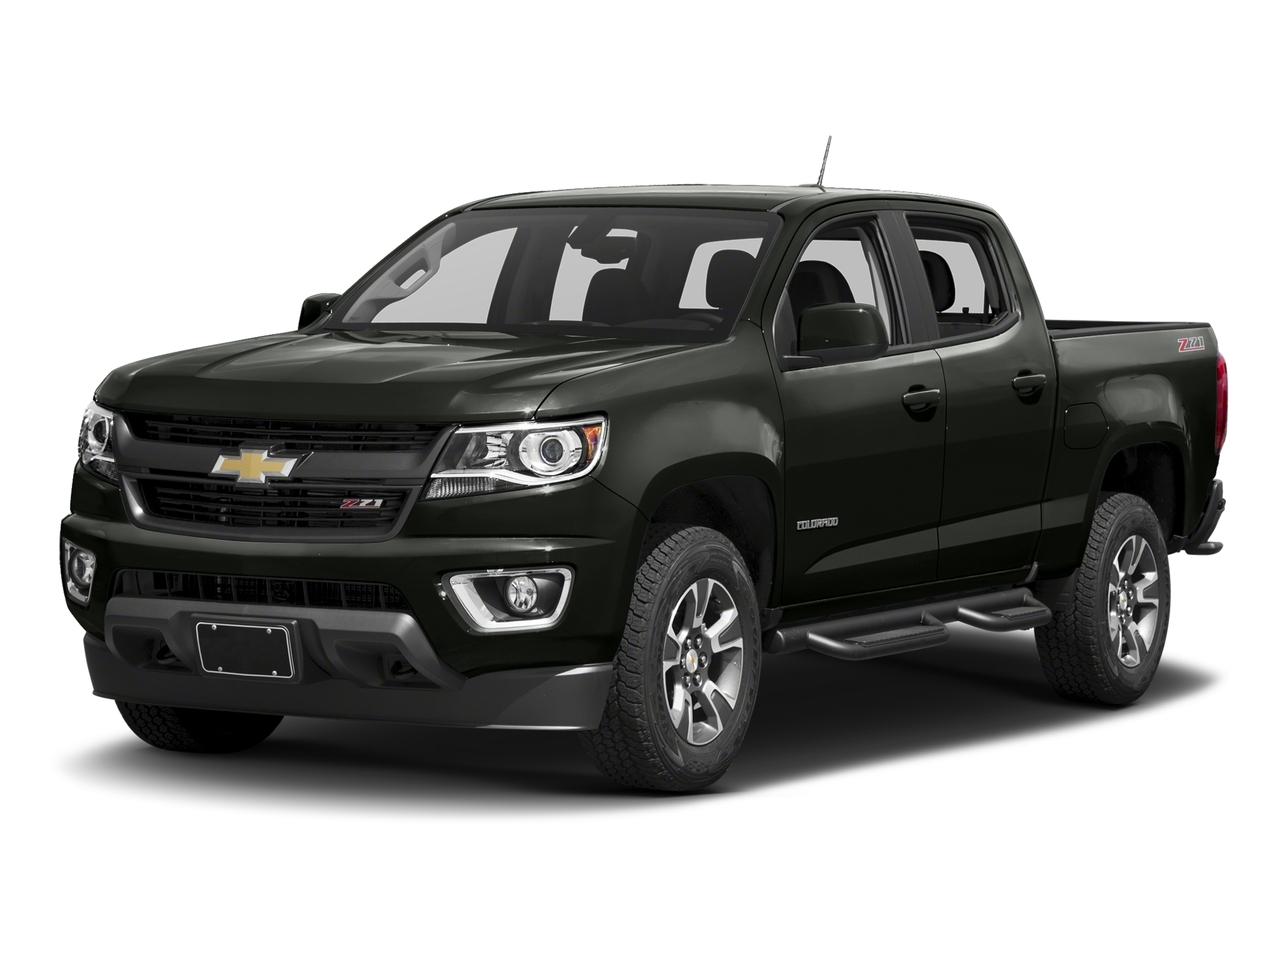 Graphite Metallic 2017 Chevrolet Colorado Z71 Crew Cab Pickup Wake Forest NC